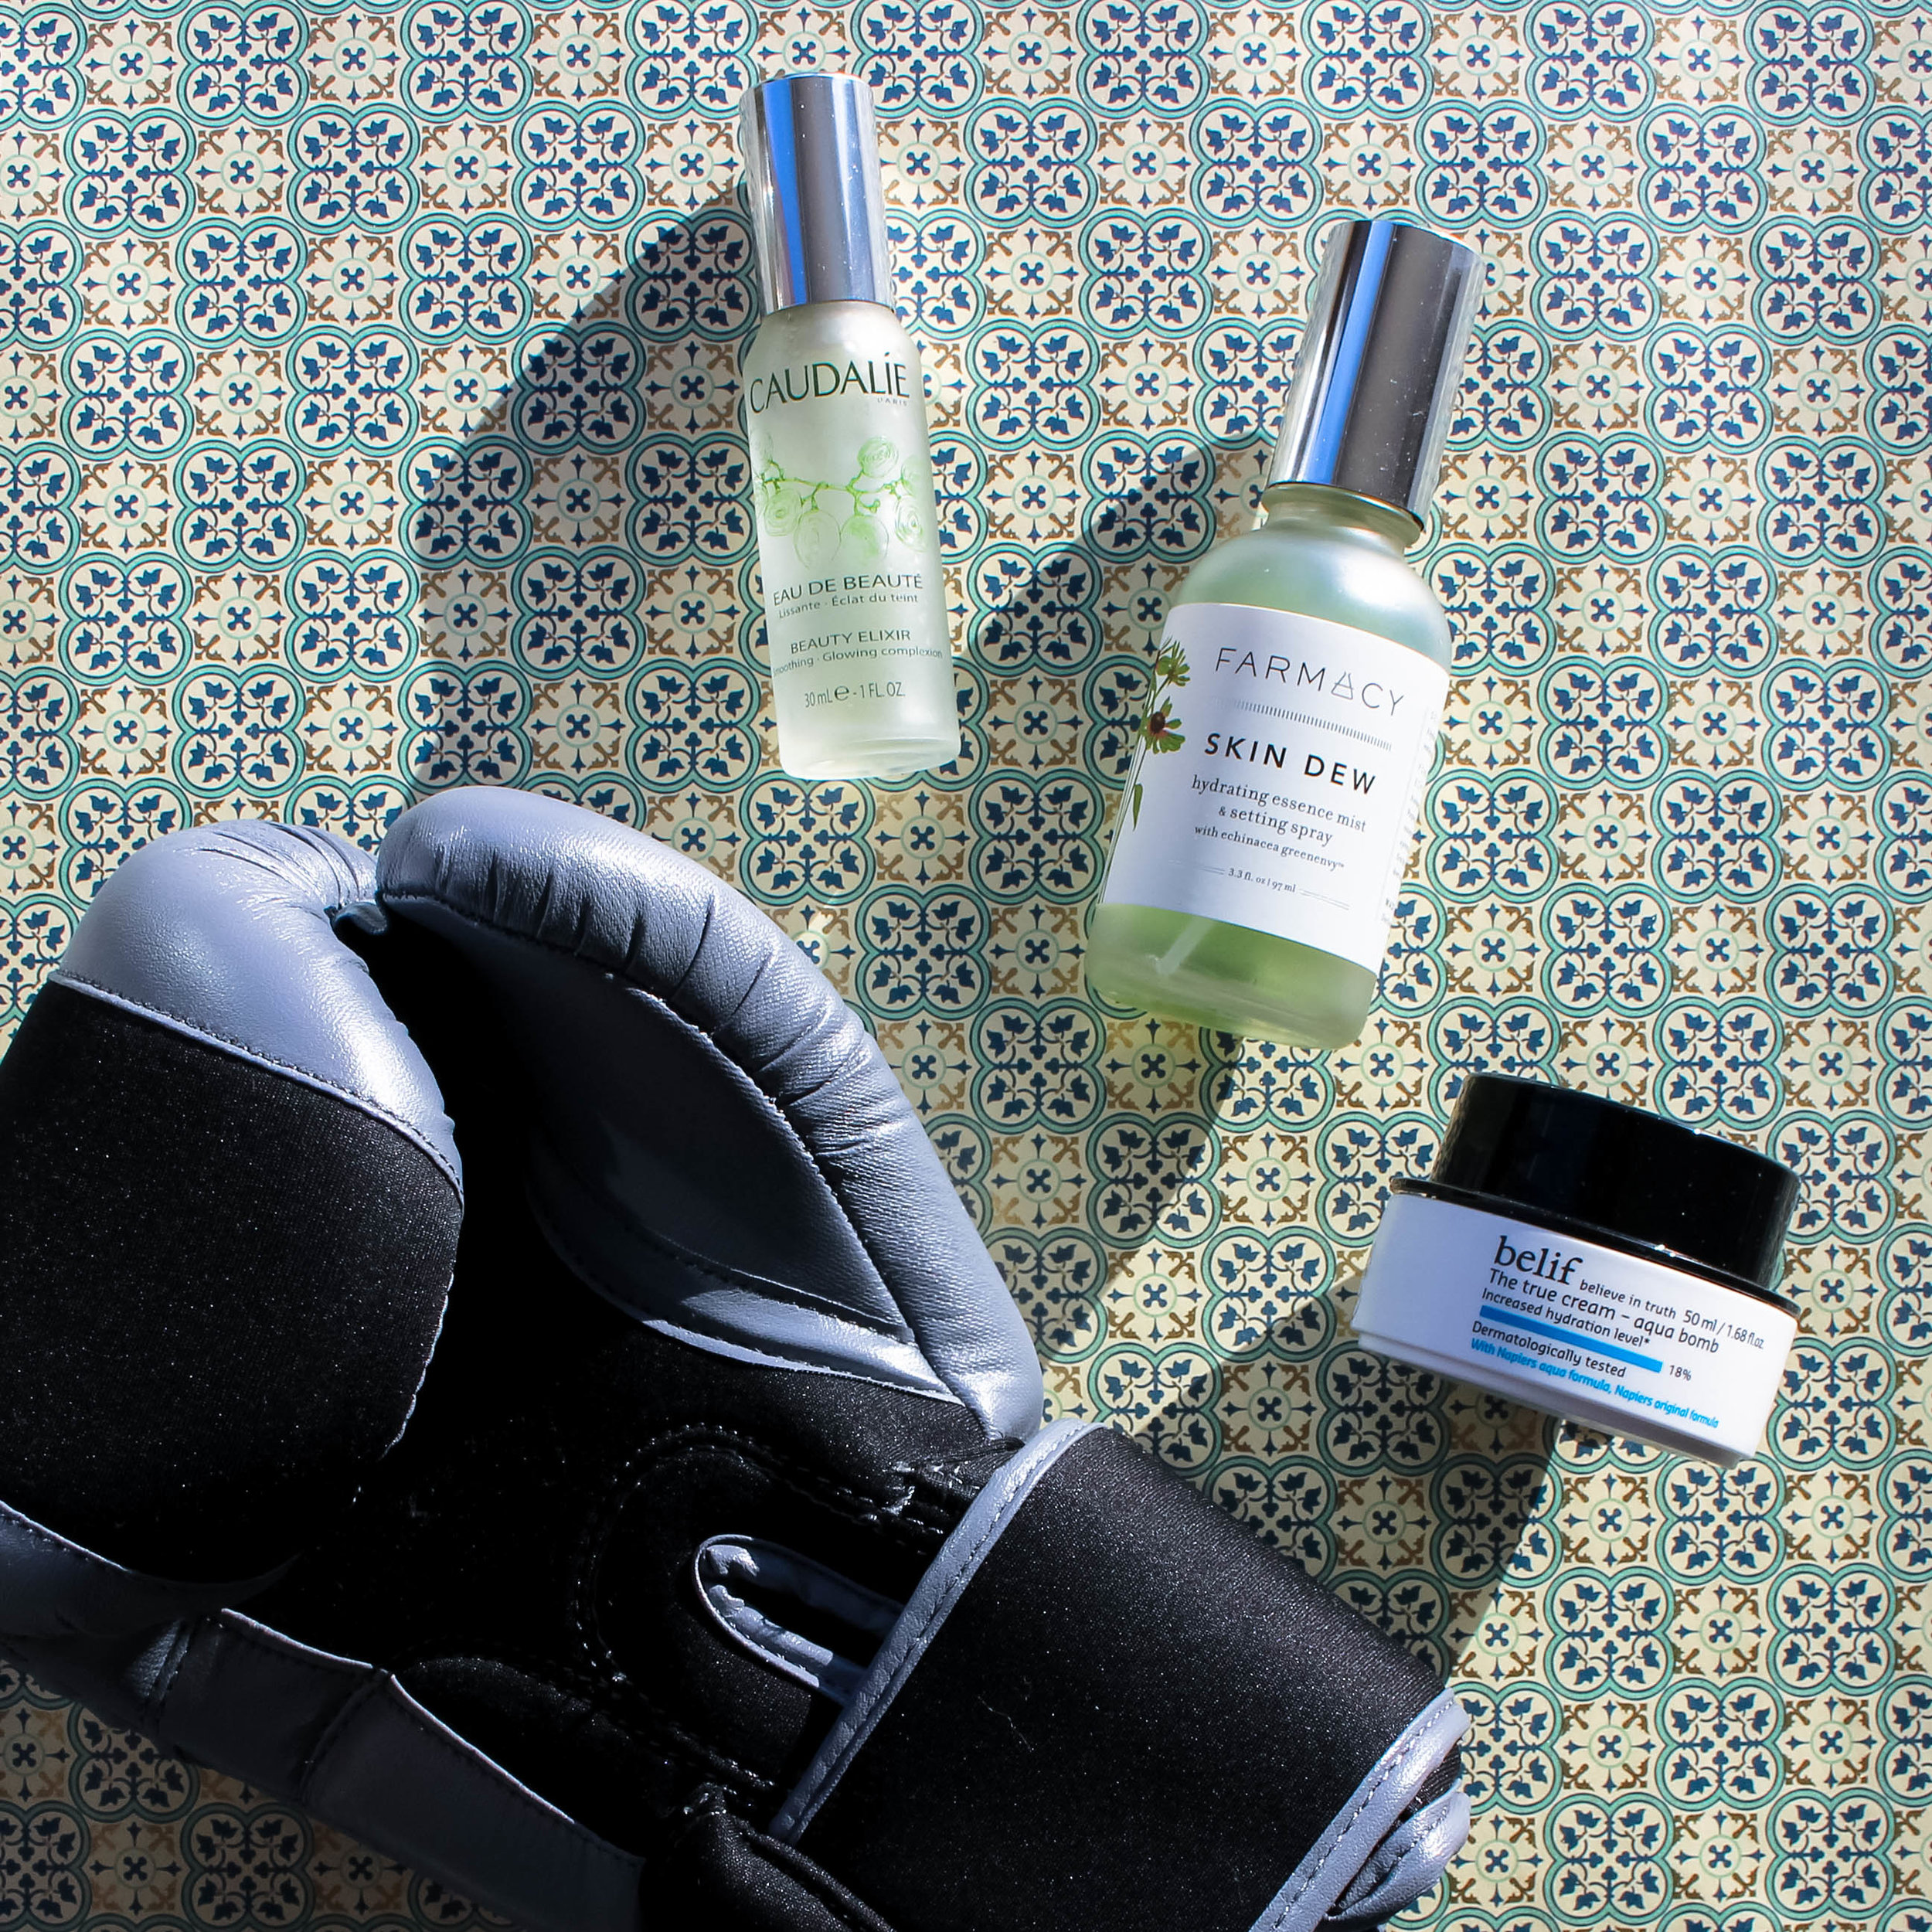 caudalie beauty elixir  // farmacy skin dew + belif aqua bomb